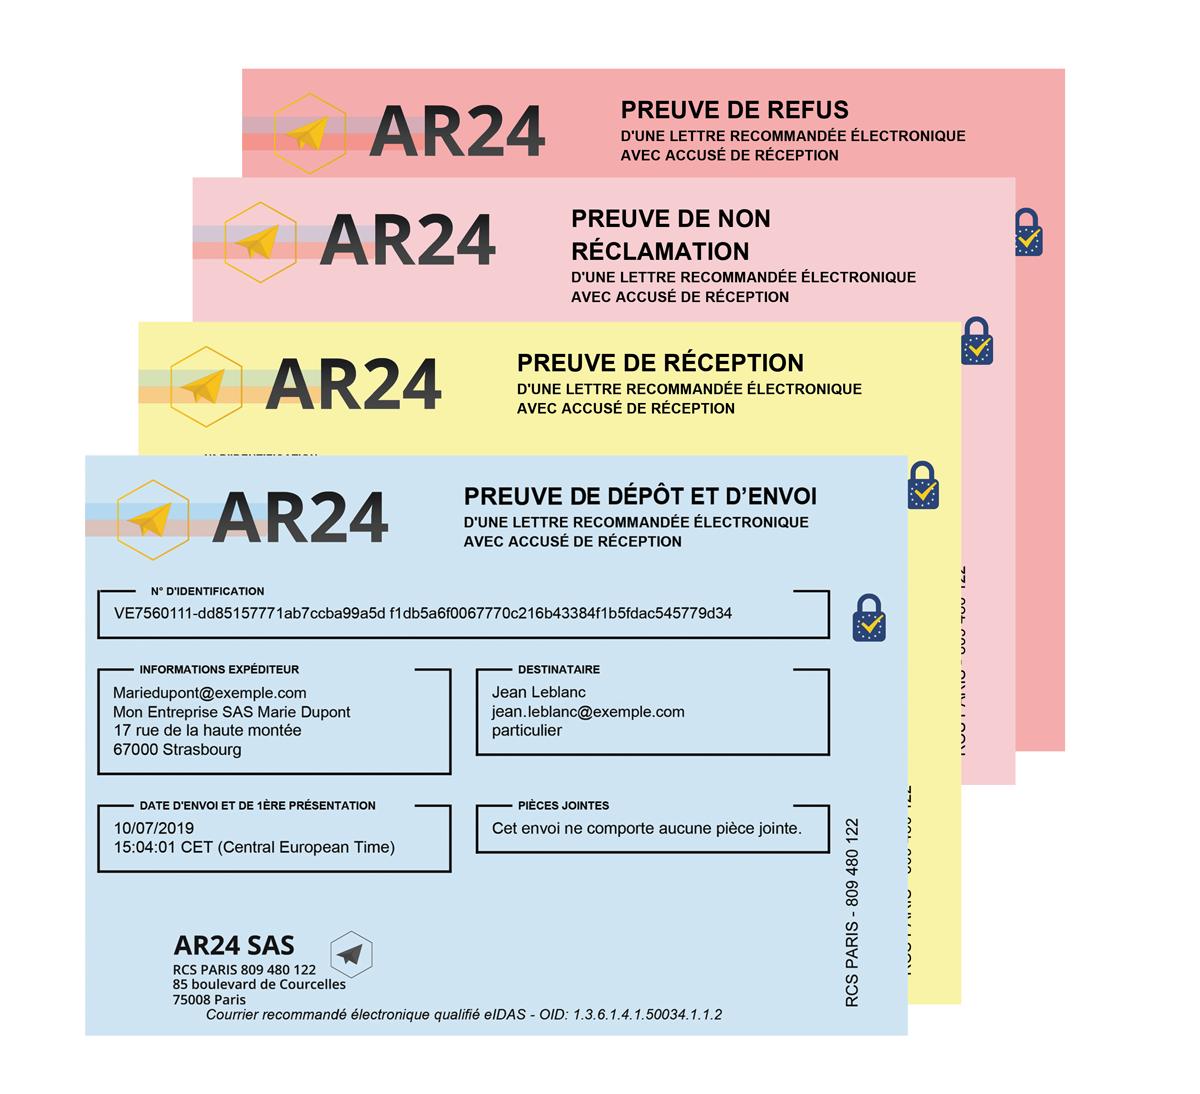 preuves-recommande-electronique-ar24